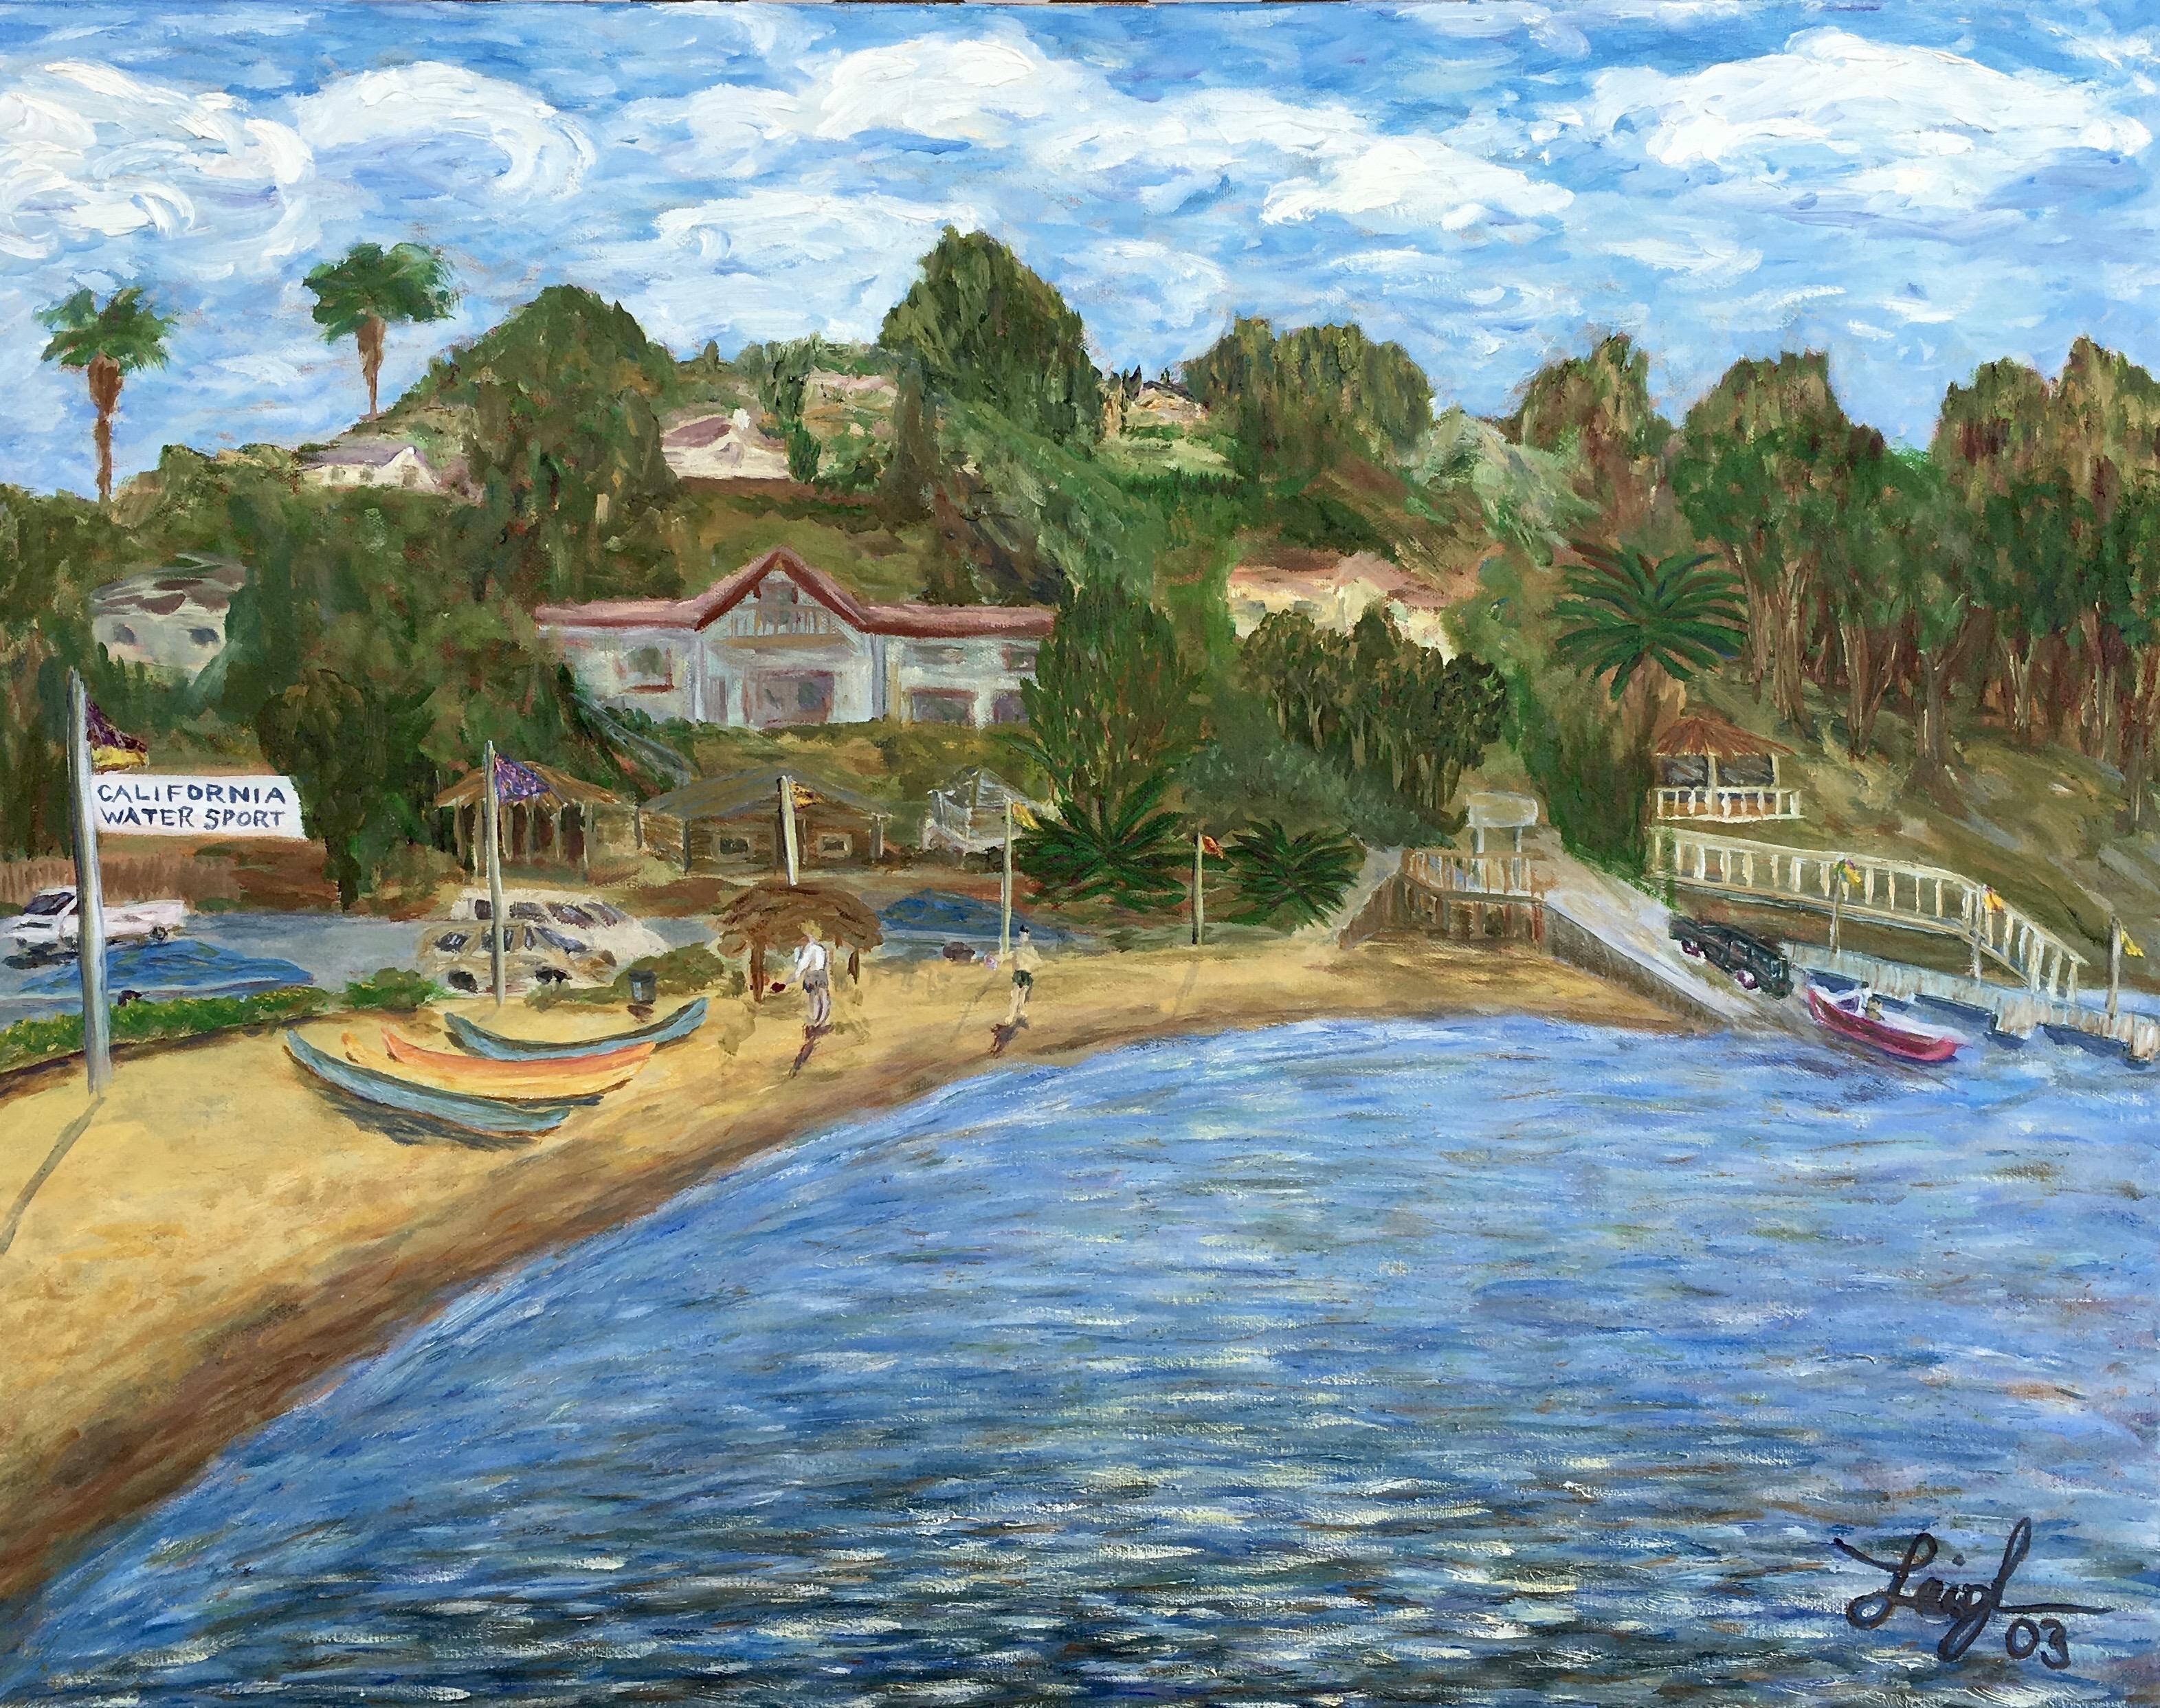 Snug Harbor  ~   2003  •  28 x 22